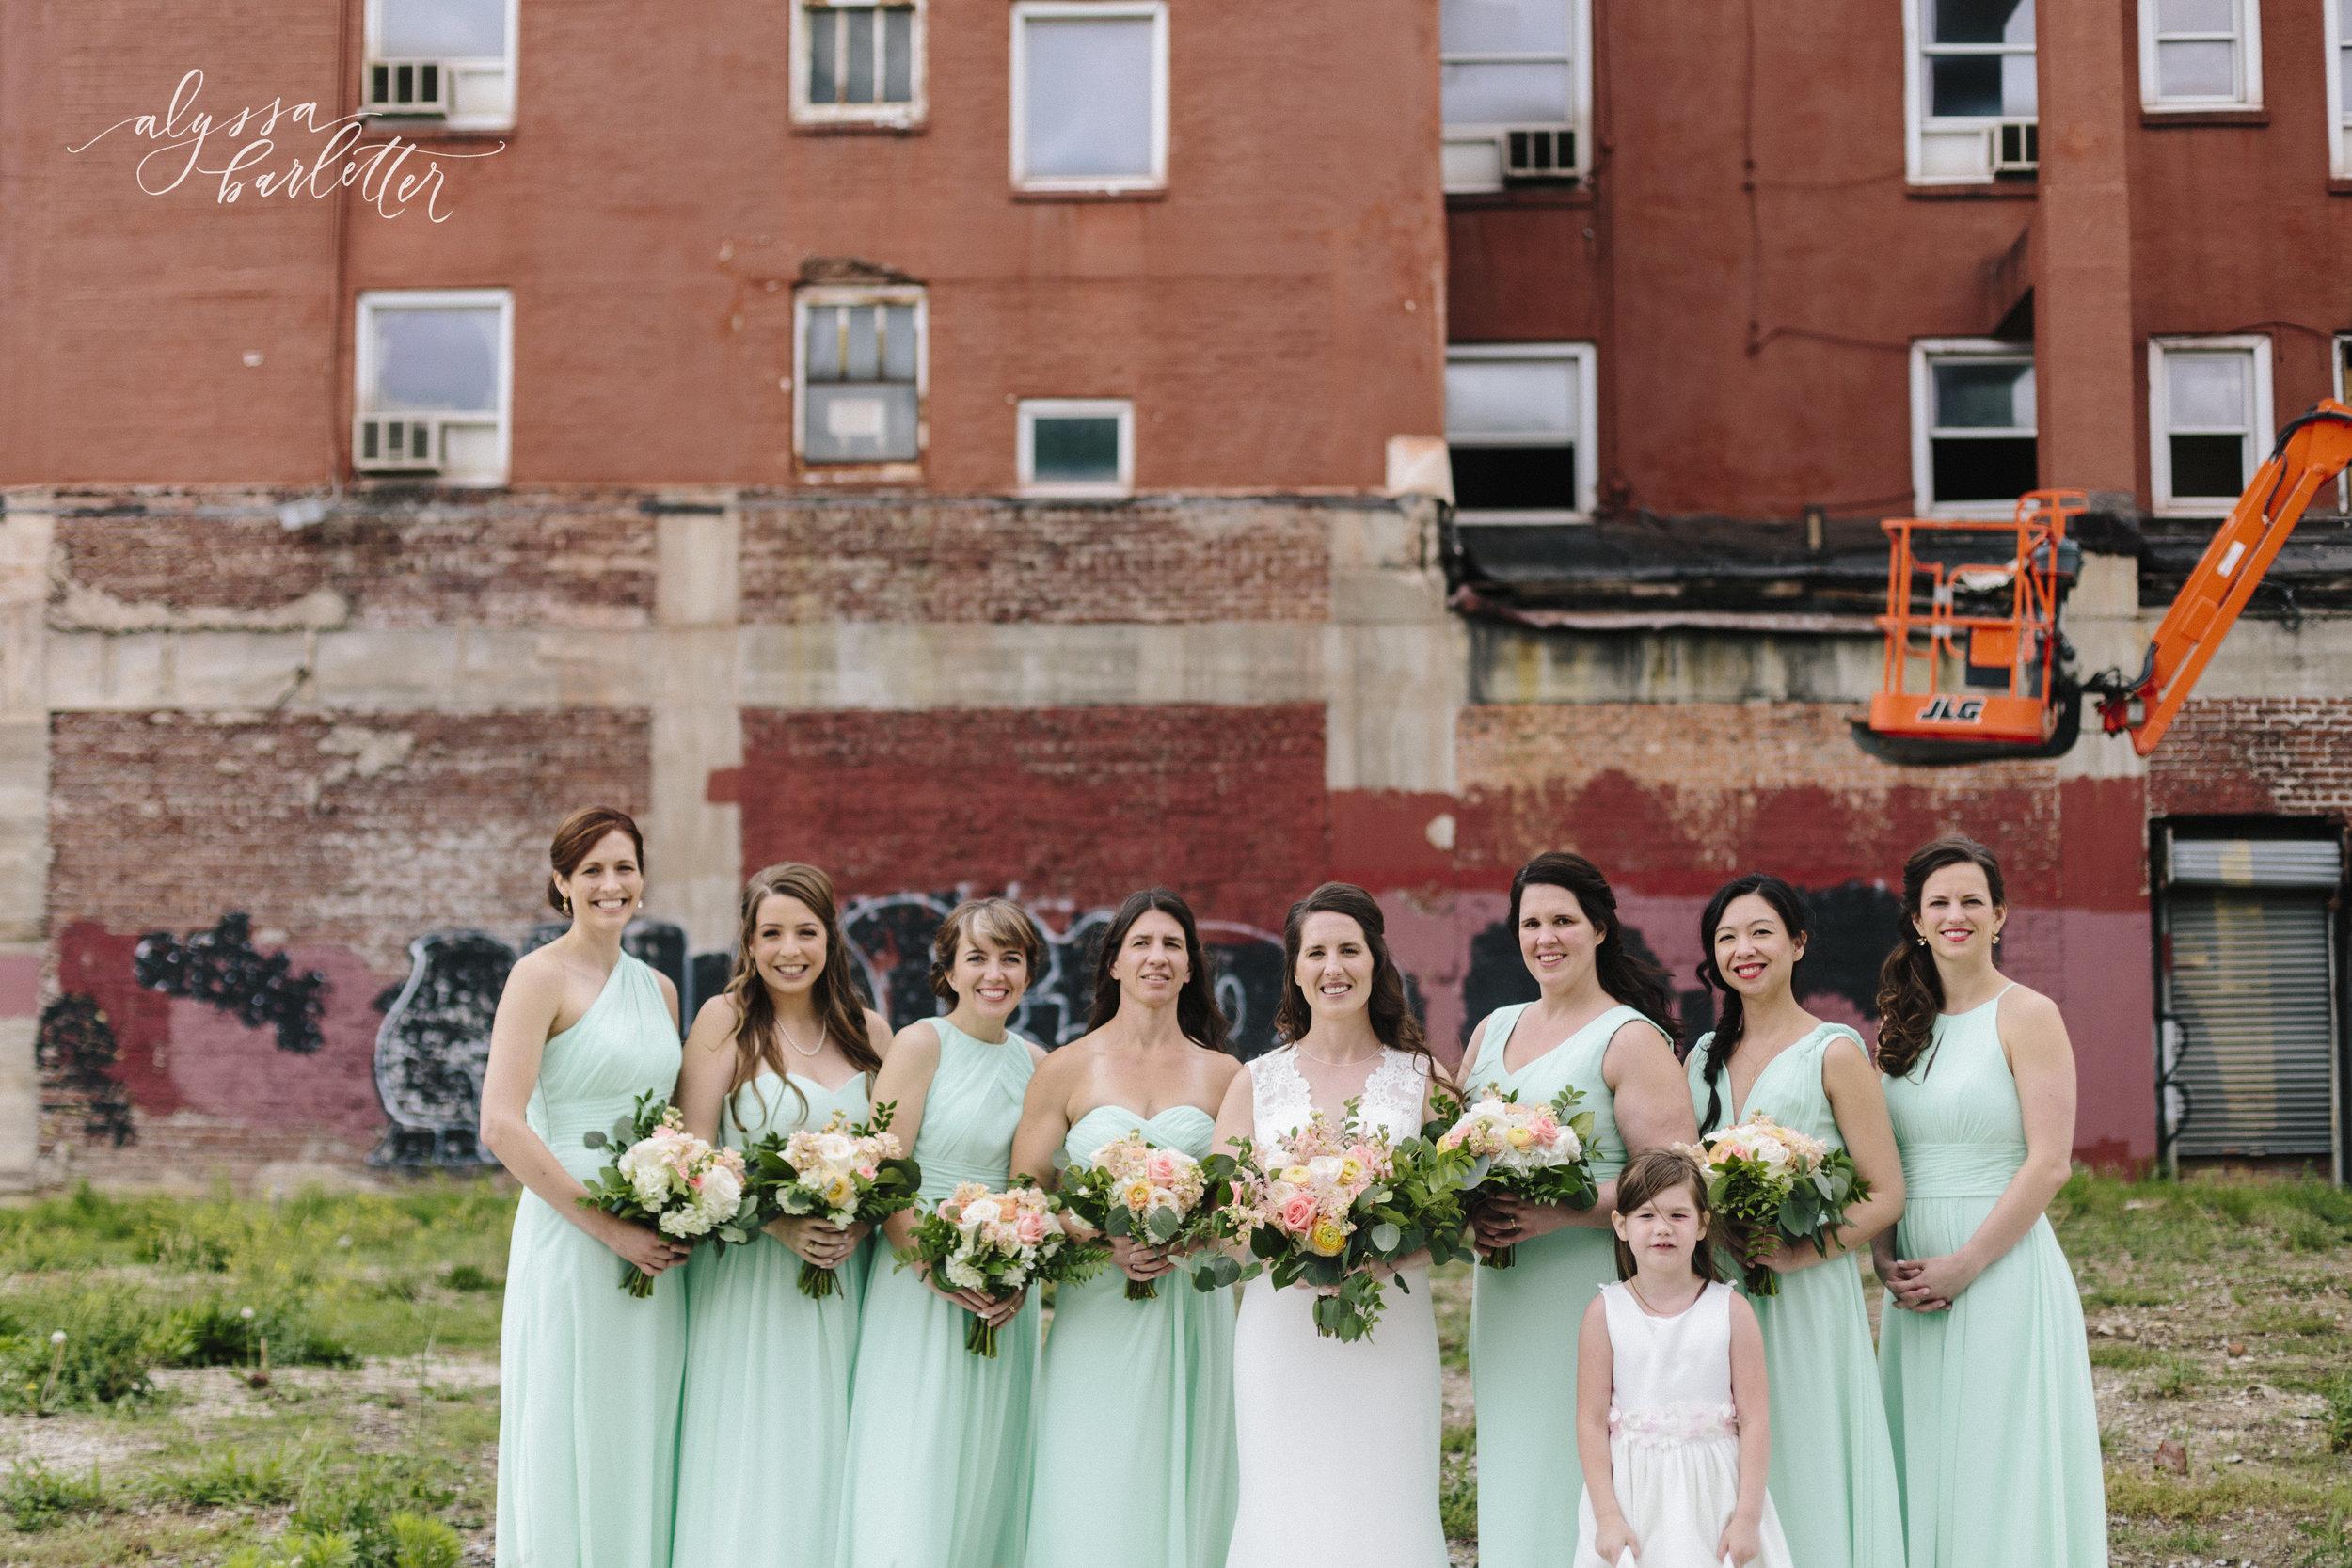 alyssa barletter photography kansas city wedding 2016 main courtney and brian-1-24.jpg